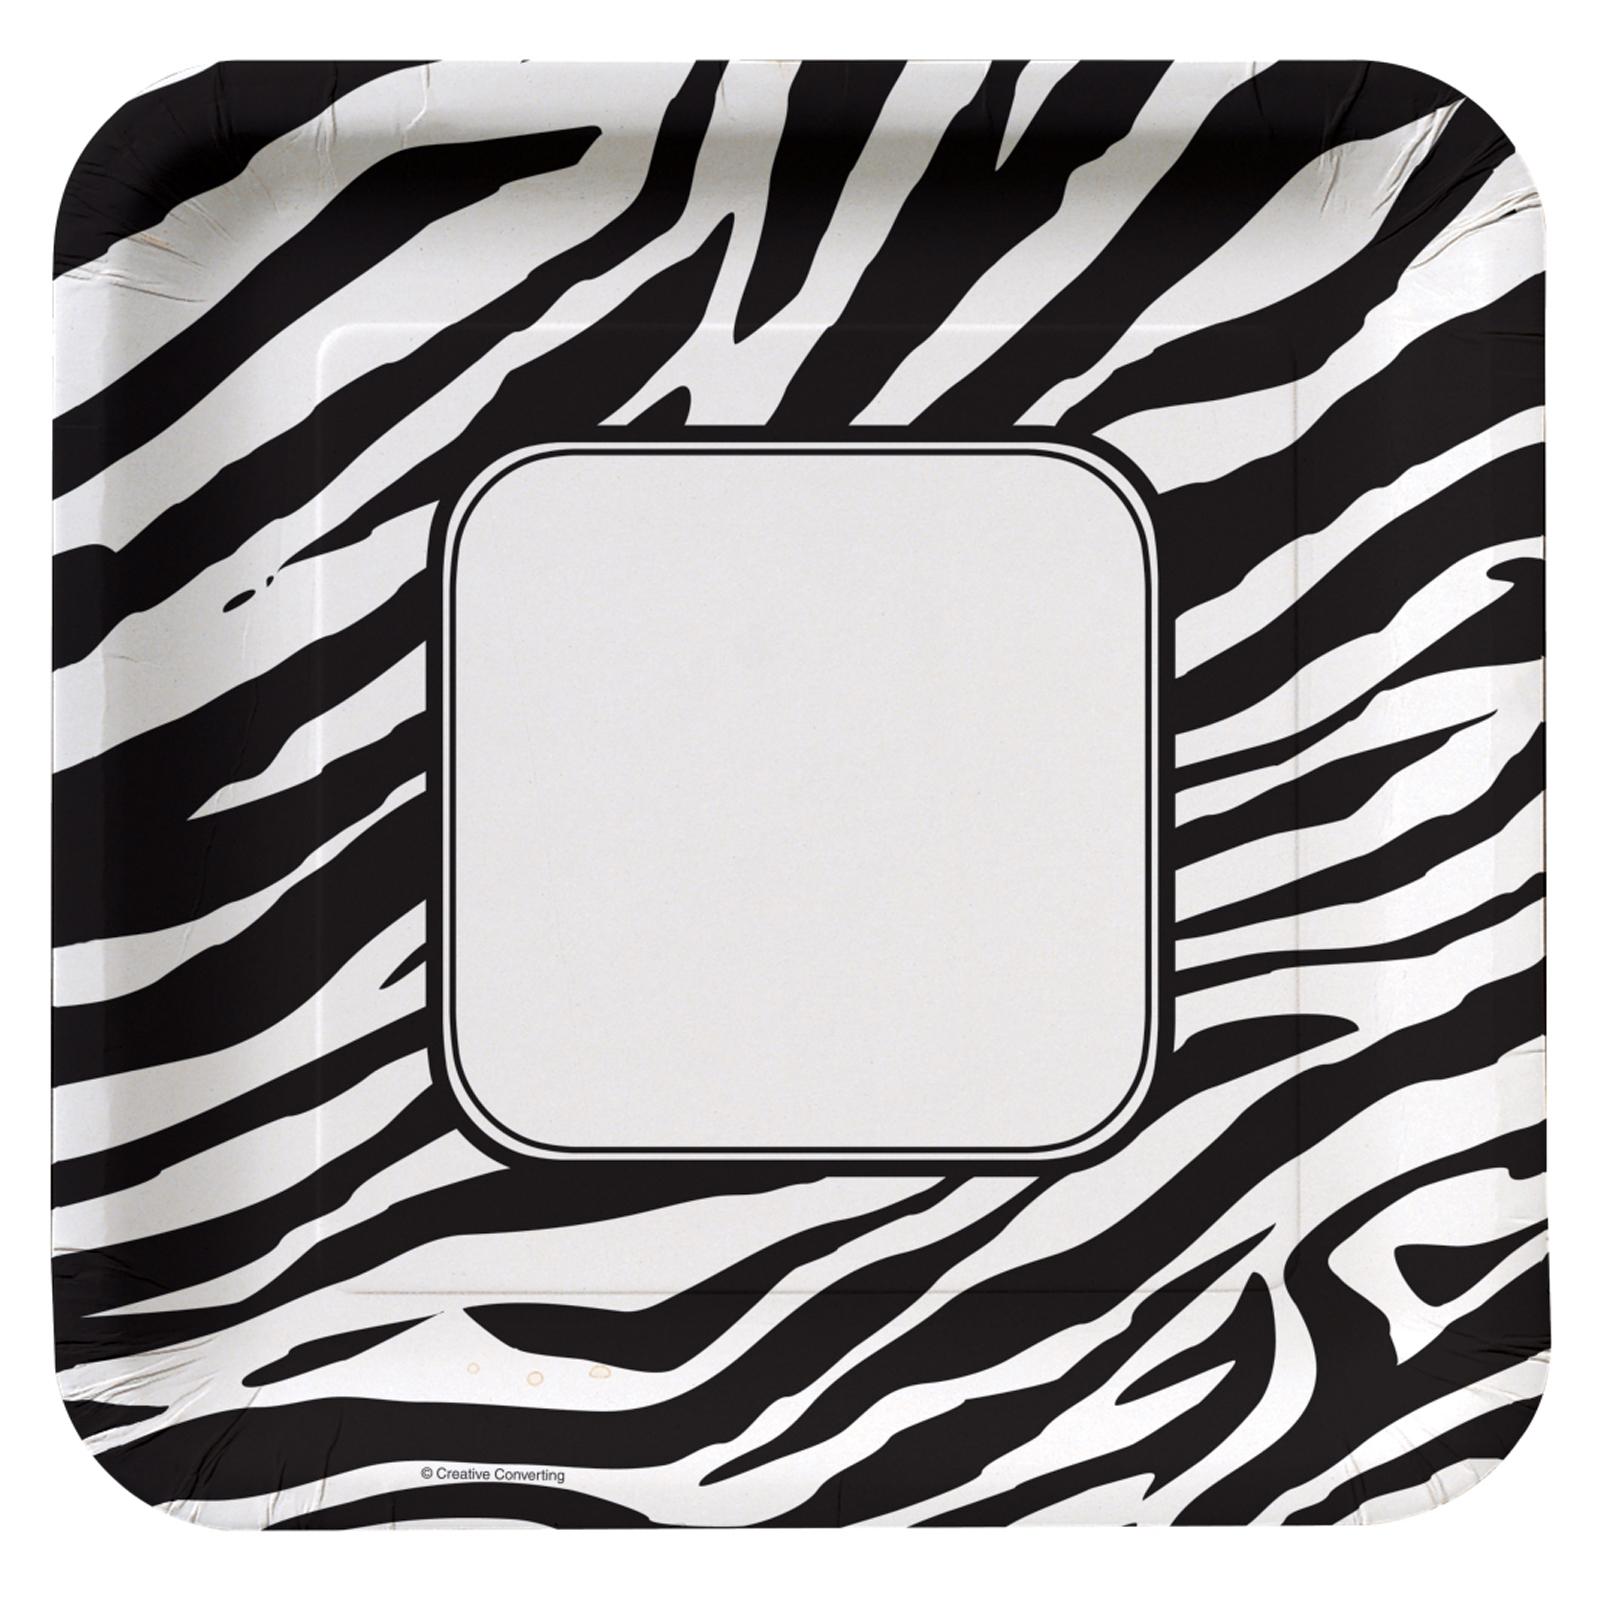 Zebra Print Border Clip Art - Cliparts.co